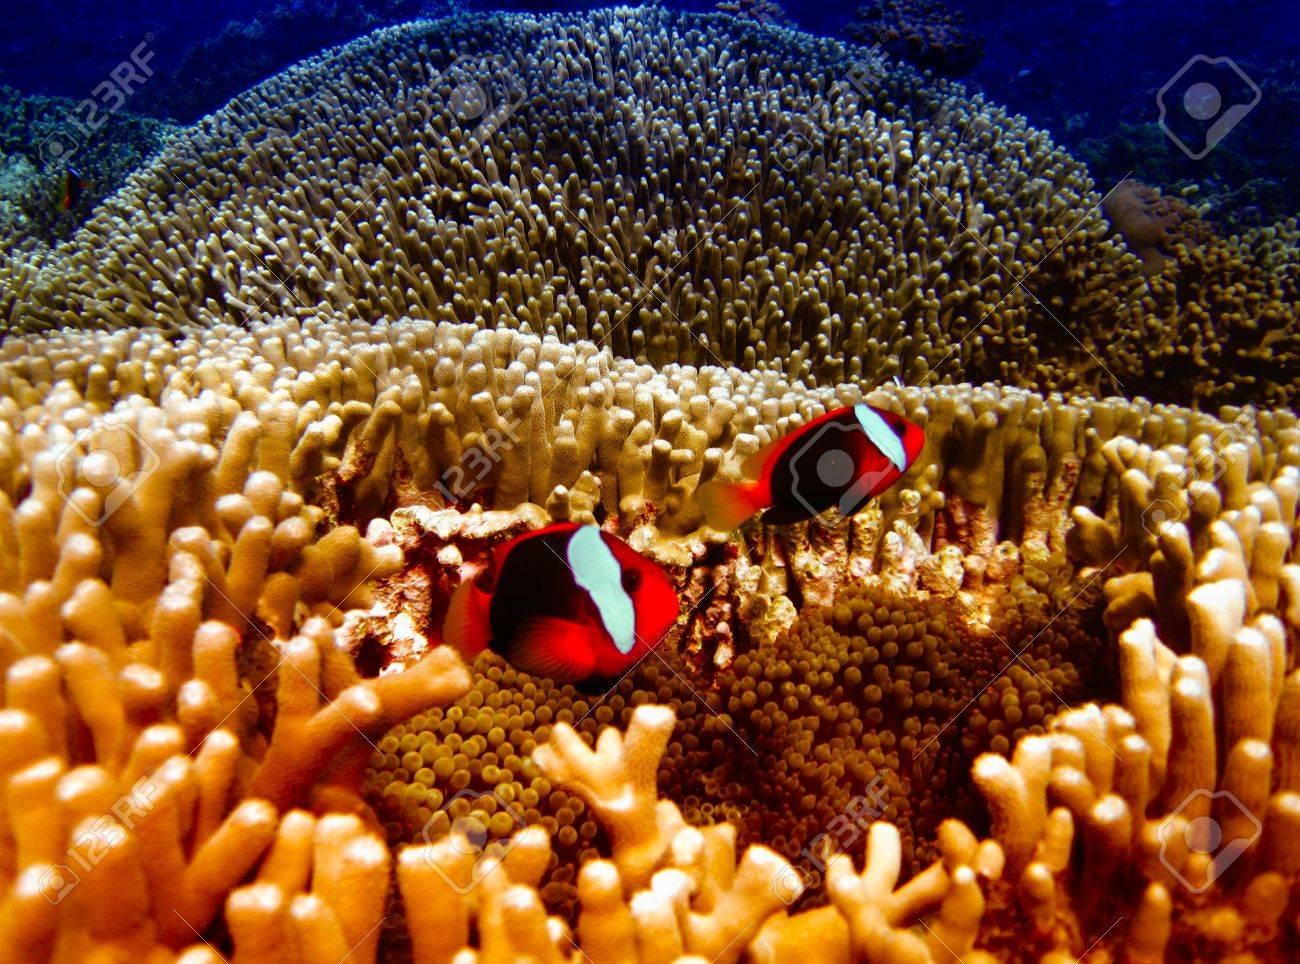 Nemo Fish on the Great Barrier Reef in Queensland, Australia Stock Photo - 16394090